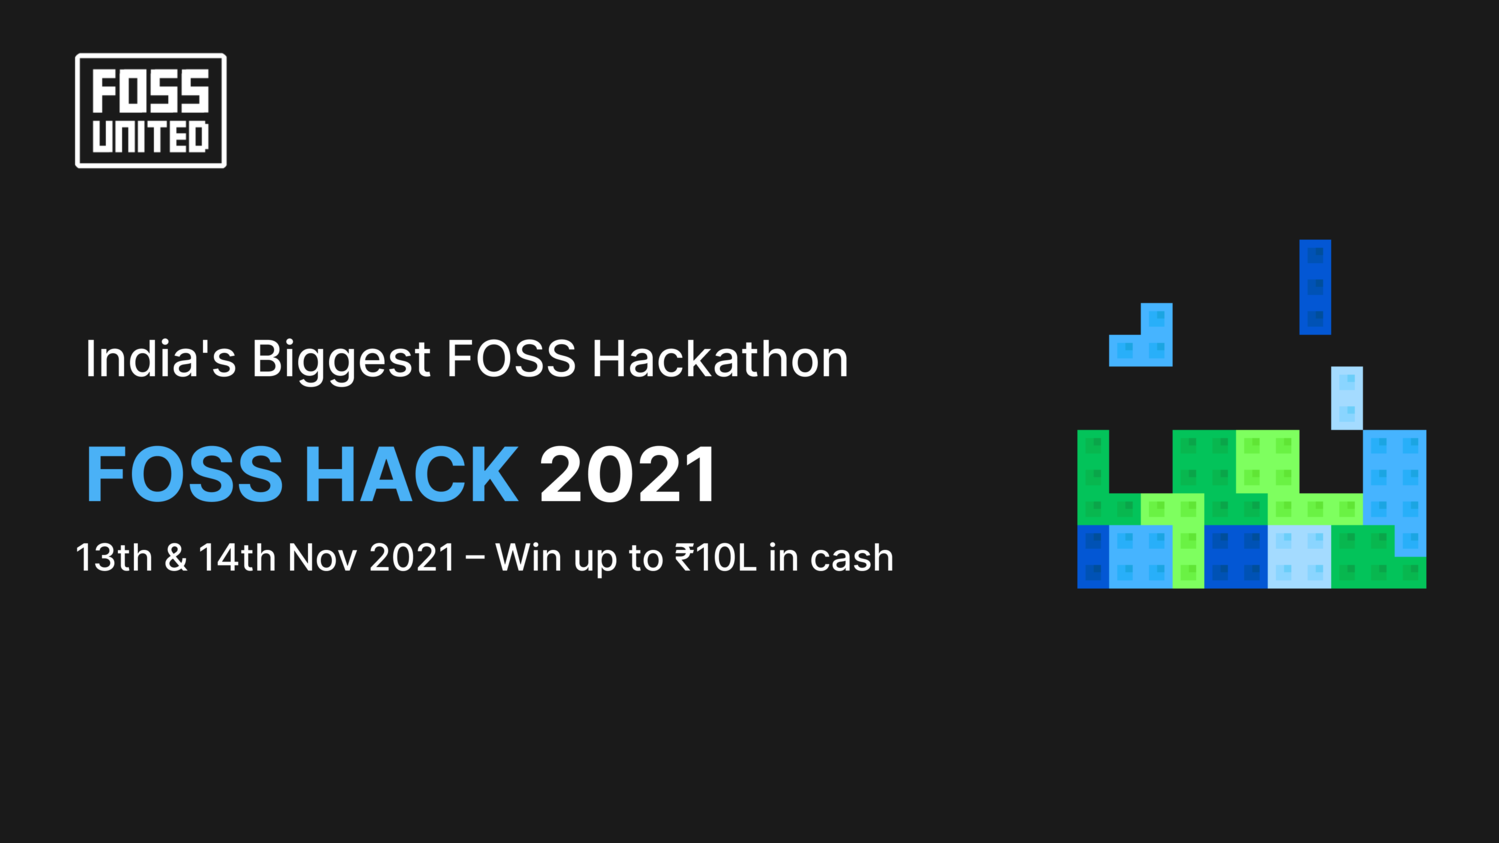 FOSS Hack 2021